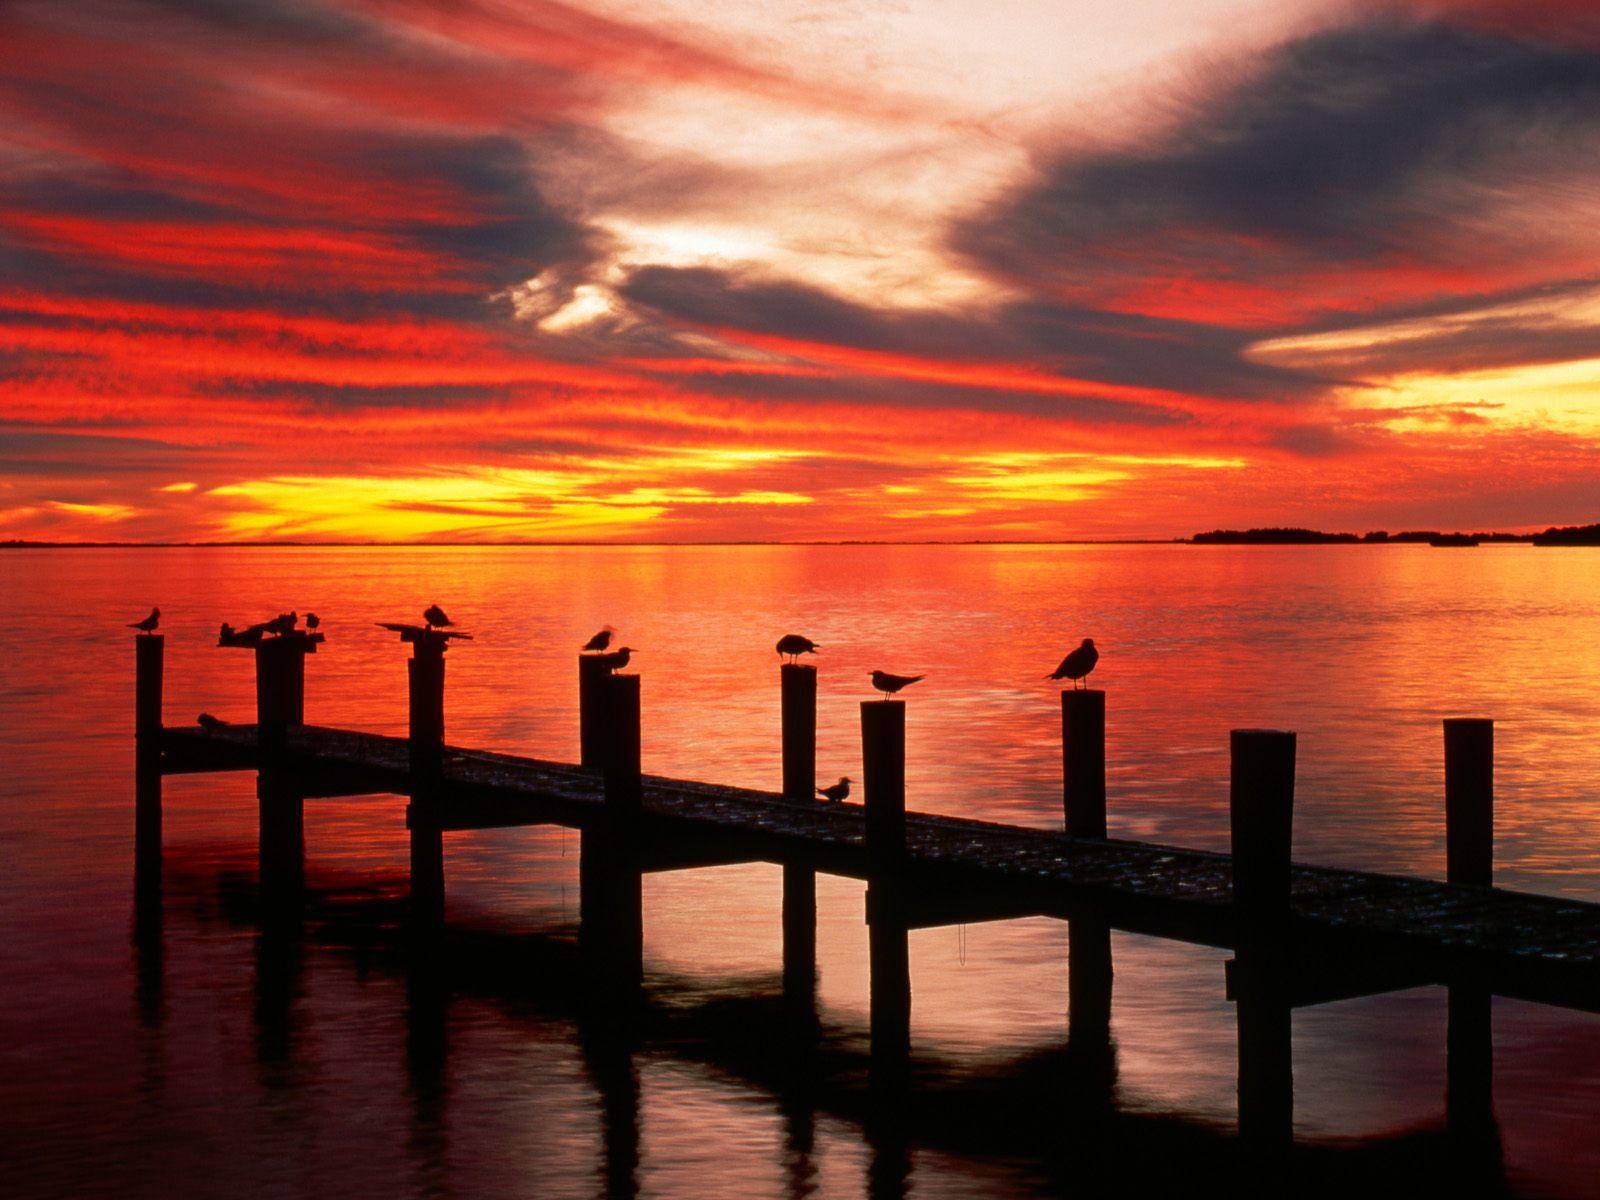 Seagulls at Sunset Florida Wallpapers HD Wallpapers 1600x1200